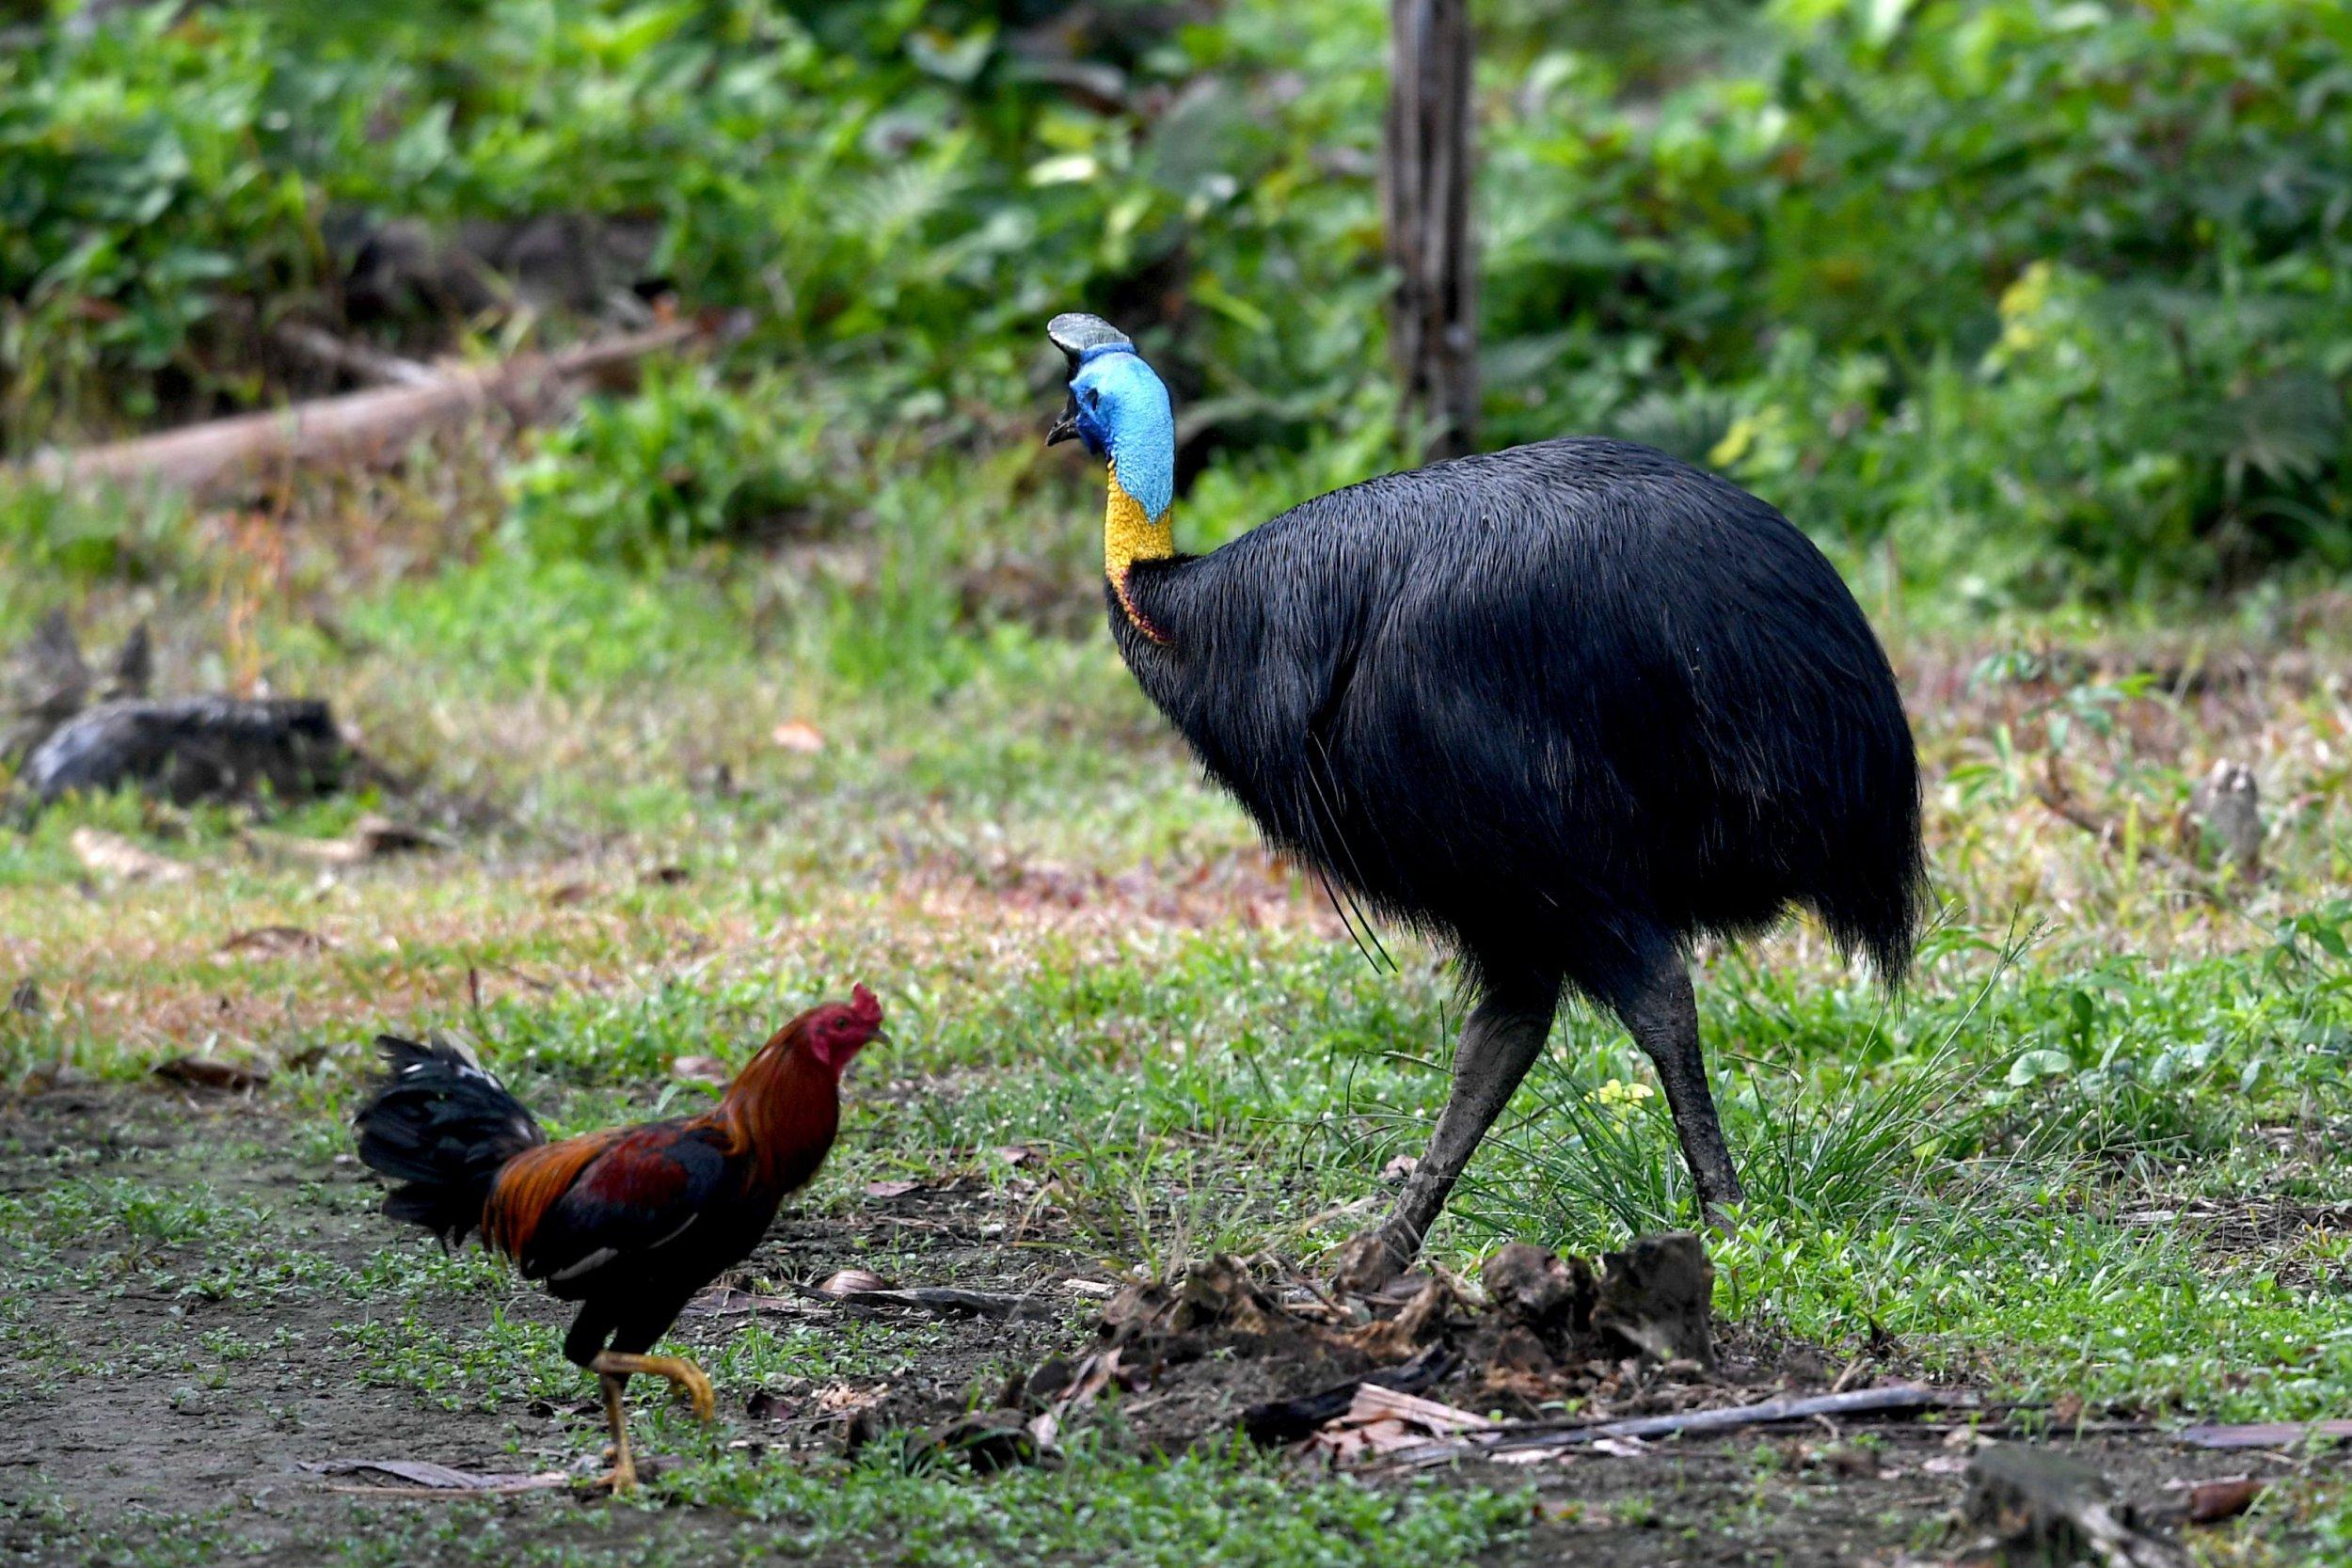 'World's deadliest bird' kills its owner after attacking him when he fell